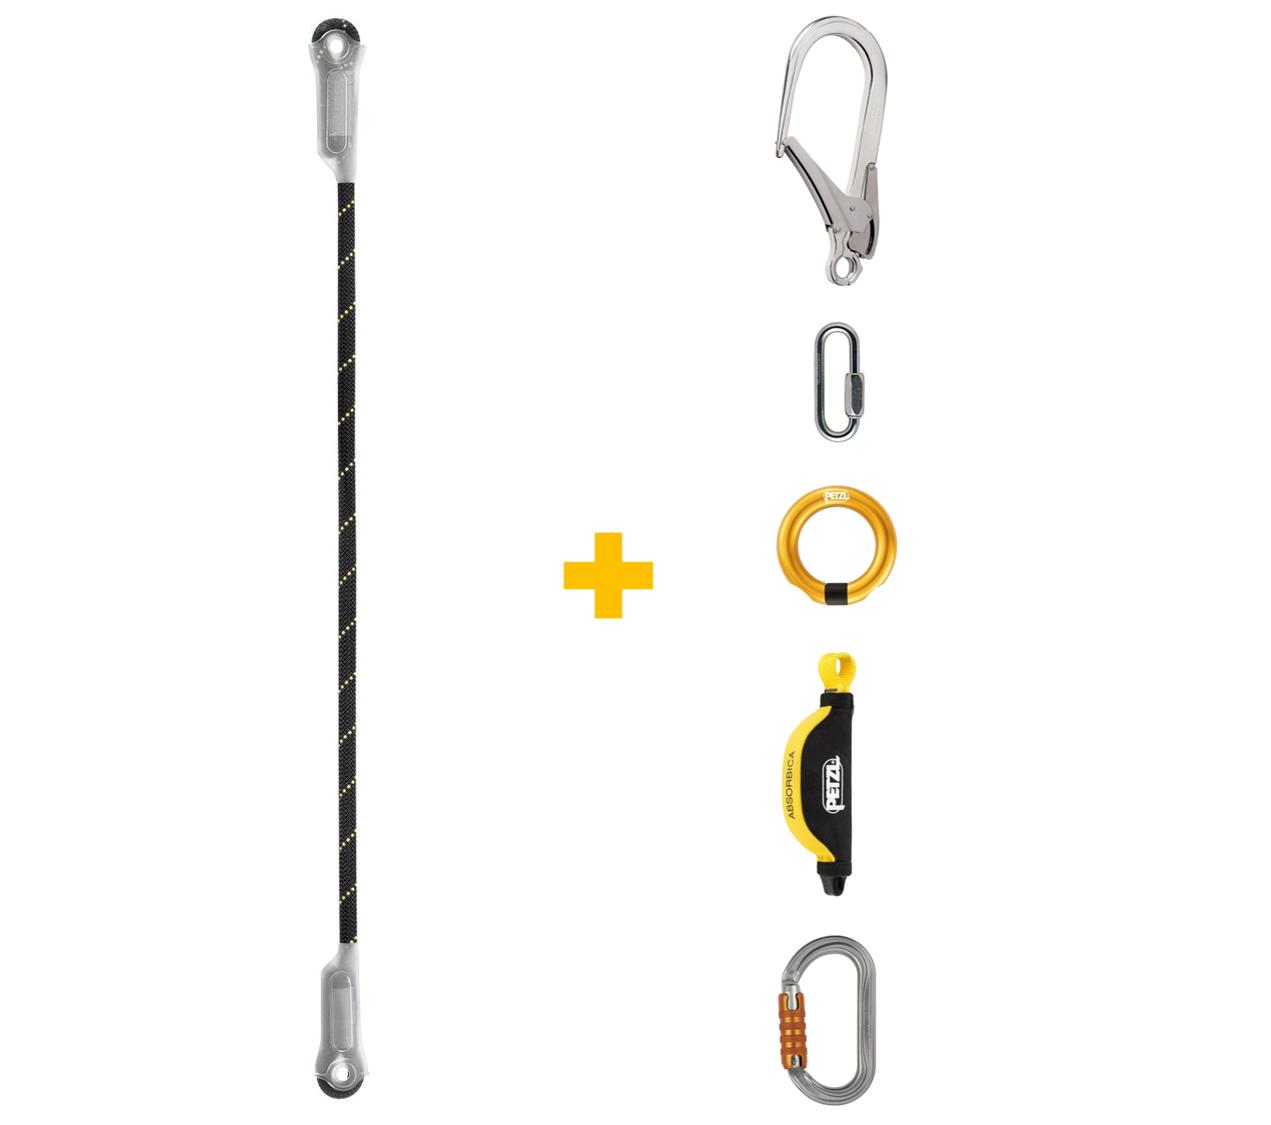 Kit - Talabarte JANE + Mosquetão MGO 110 cm + ABSORBICA + Conectores OK TL, GO e RING OPEN Petzl